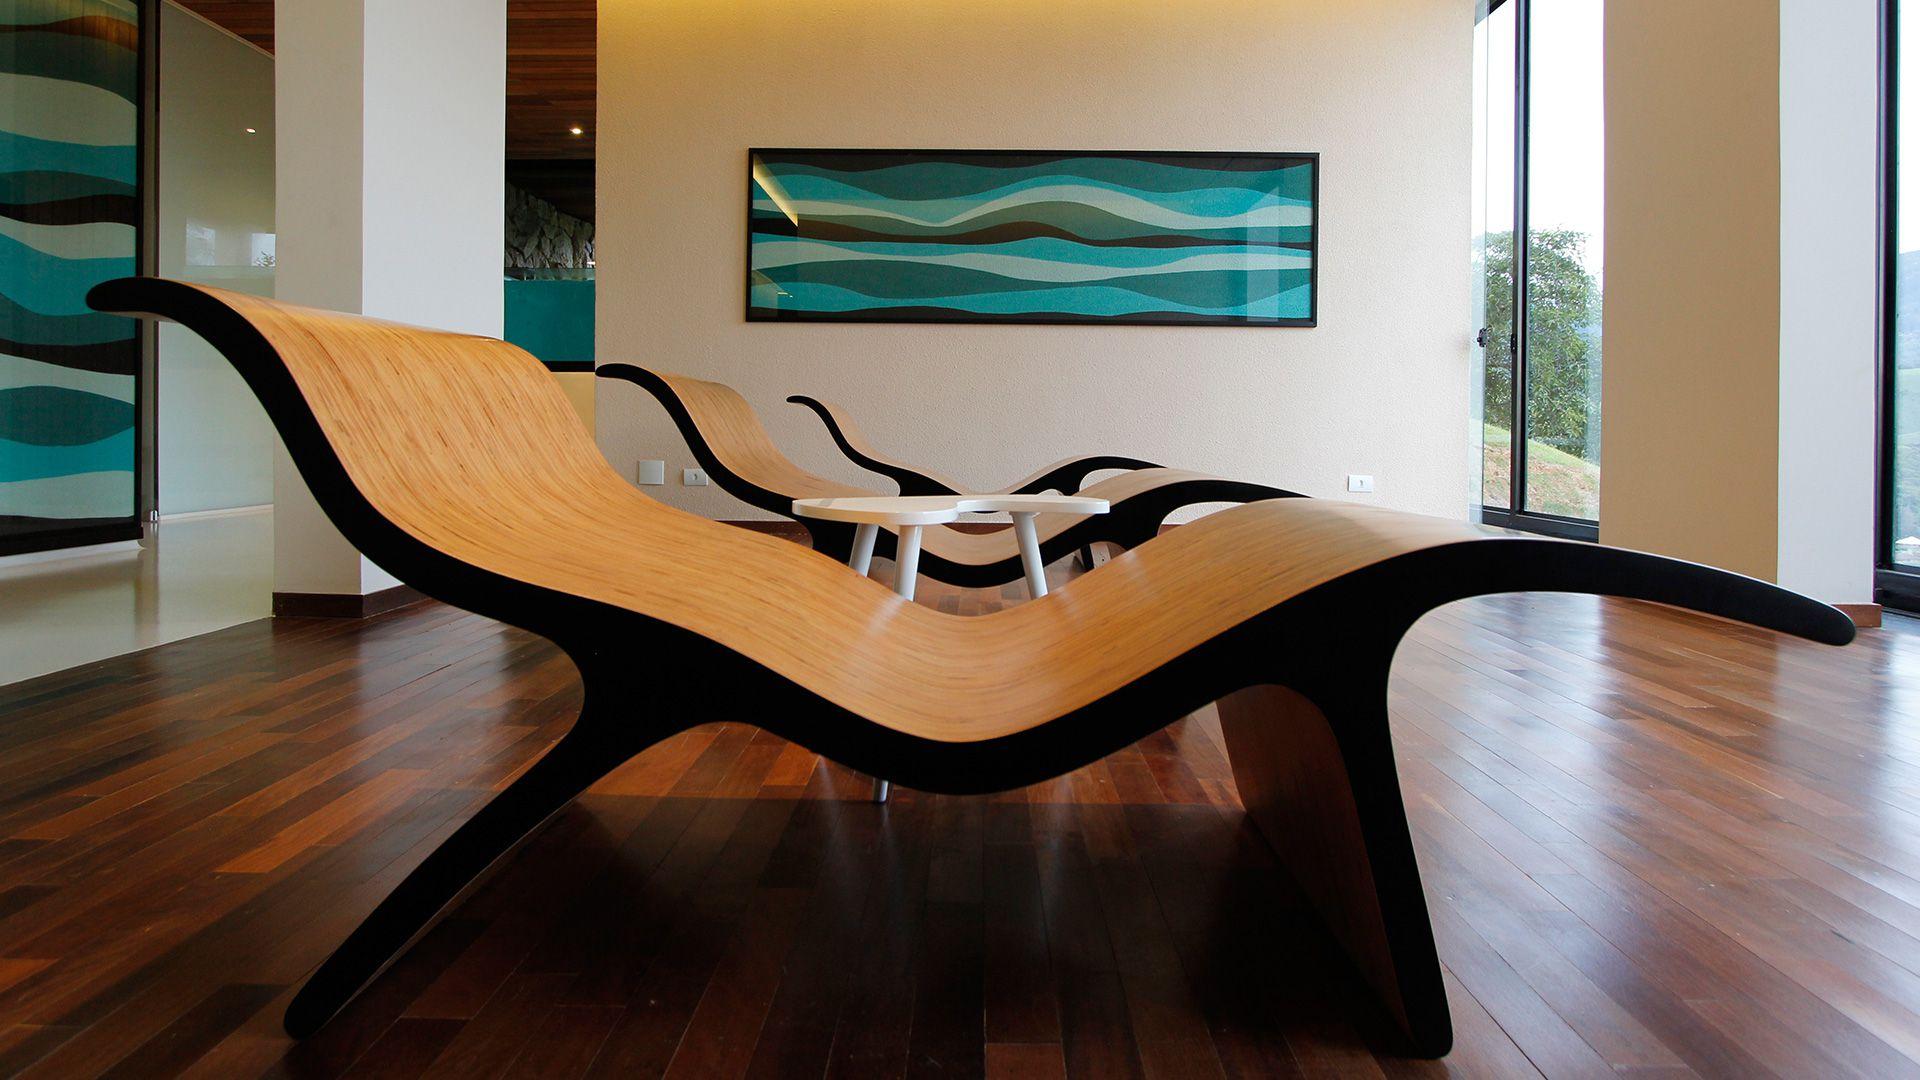 5-spa-hotel-botanique-foto-mobiliario-compondo-com-serigrafia